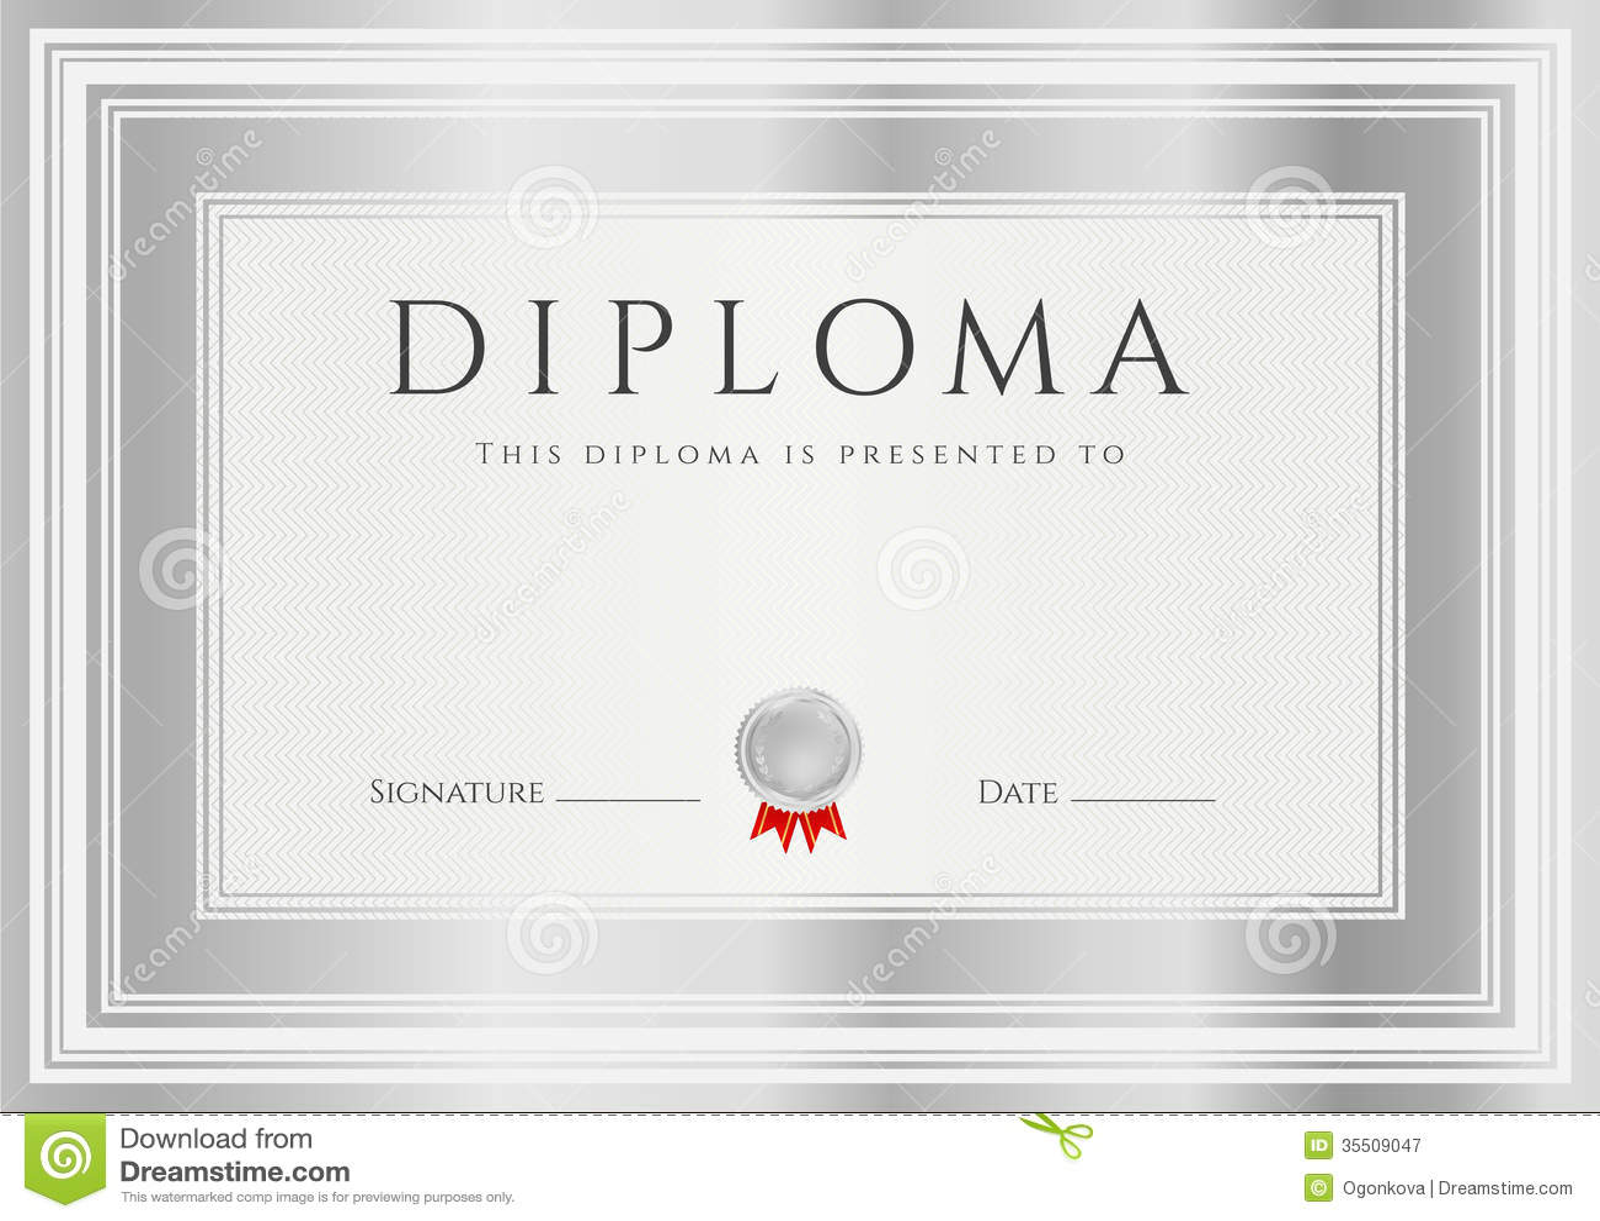 Achievement Certificates Templates Free